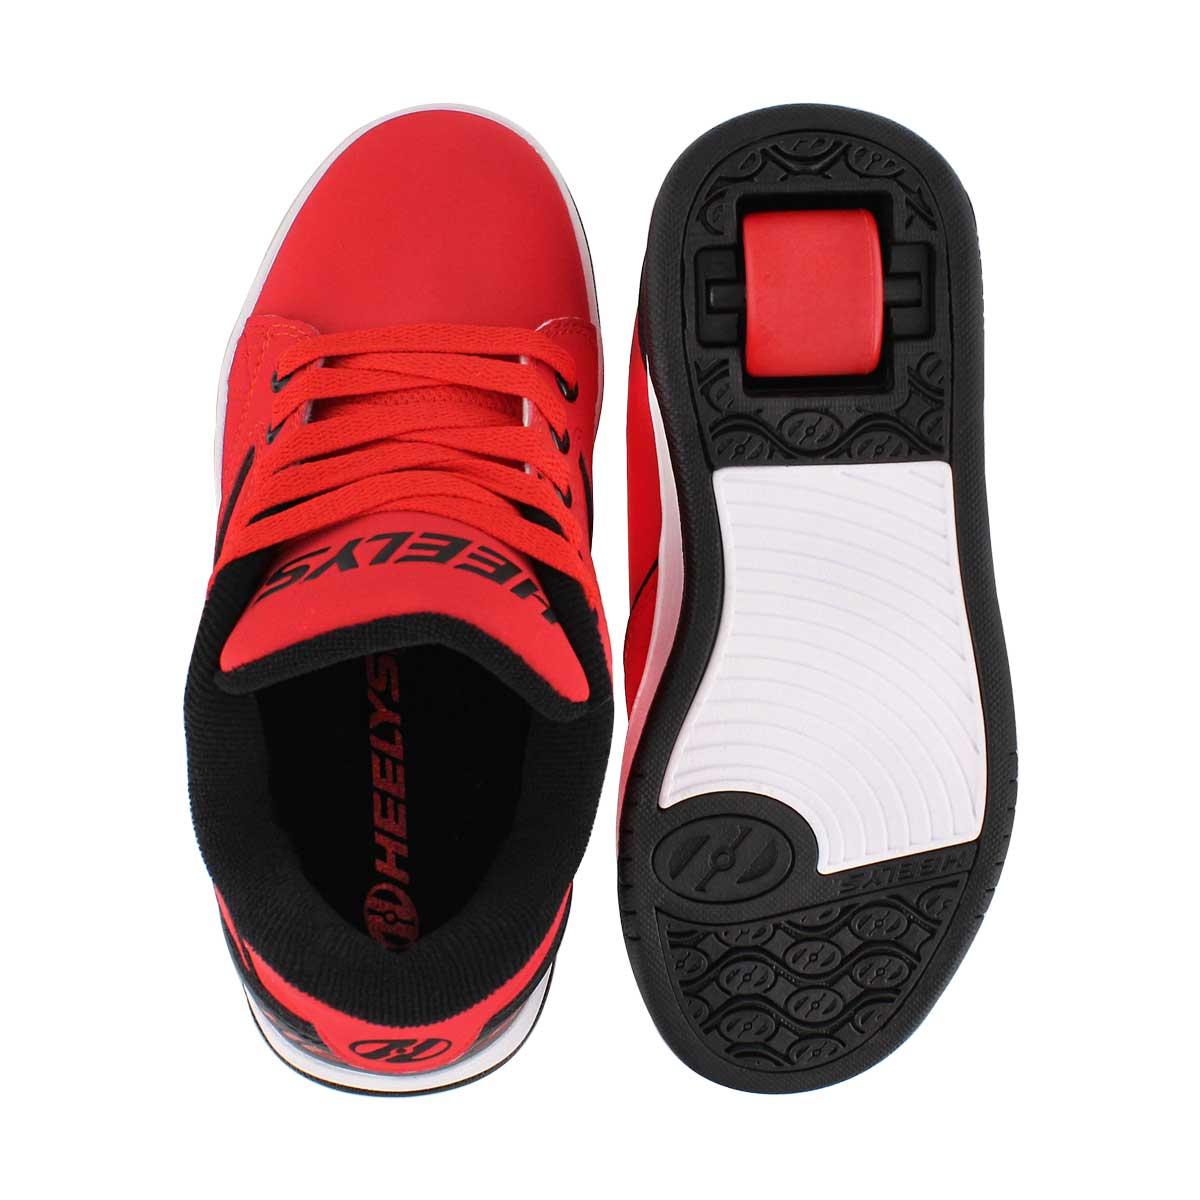 Bys Propel 2.0 blk/red/wht skate sneaker